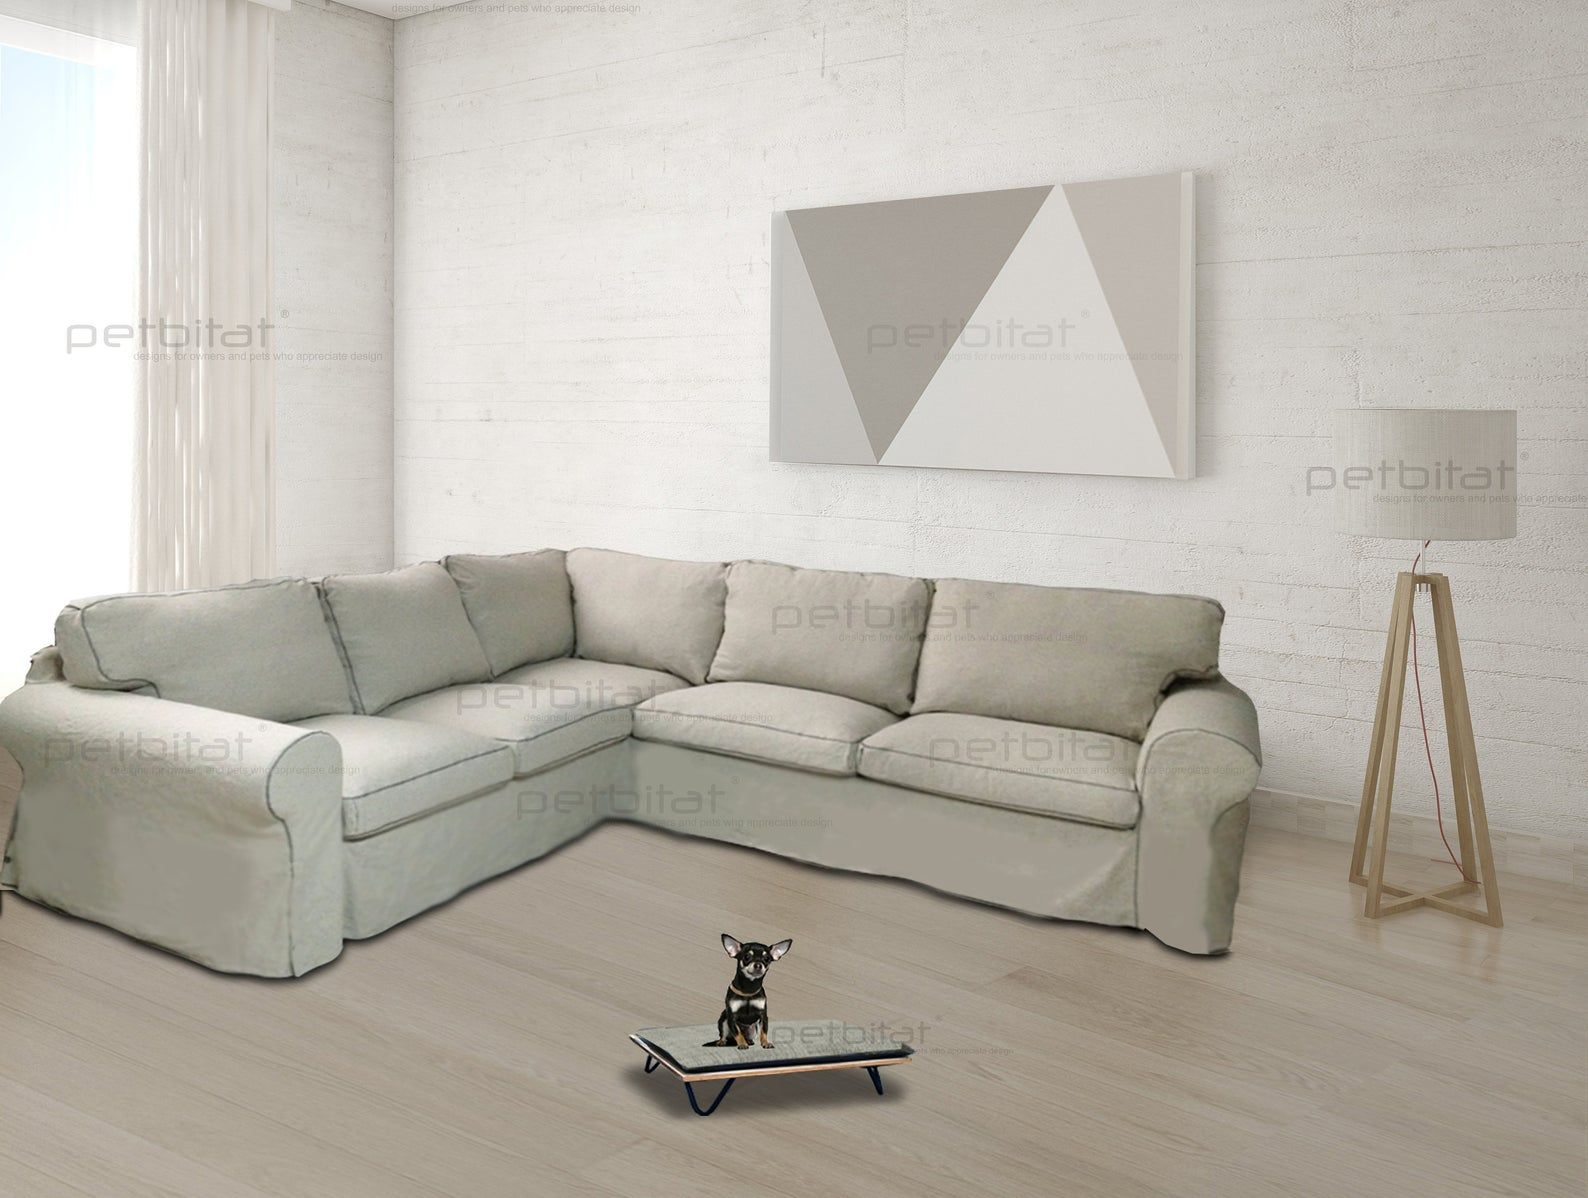 Ikea Rp 2 Seat Sectional Sofa